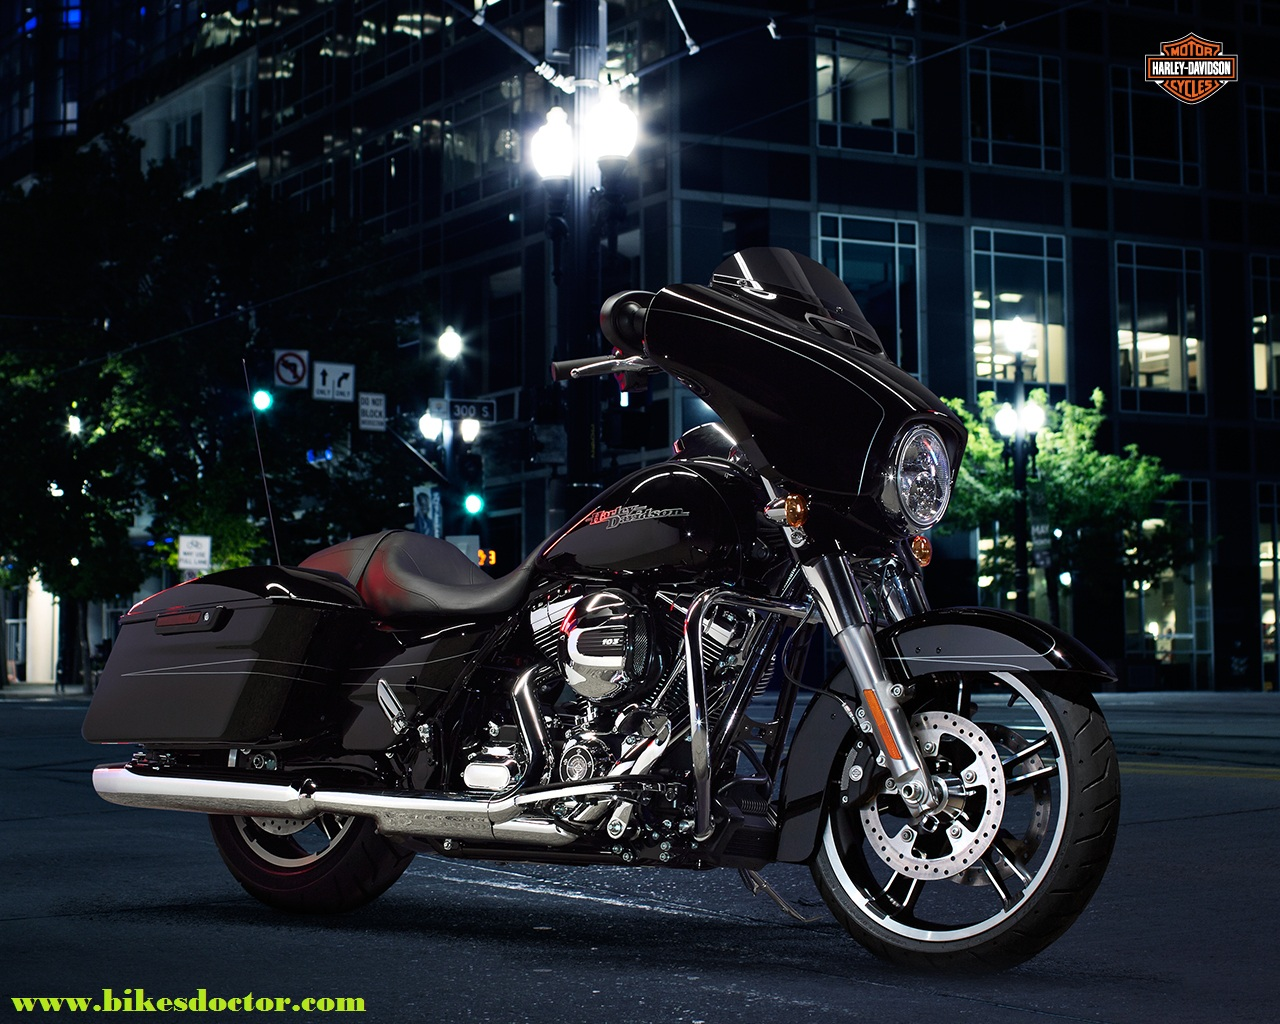 Harley-Devidson500-750 Wallpapers bikesdoctor